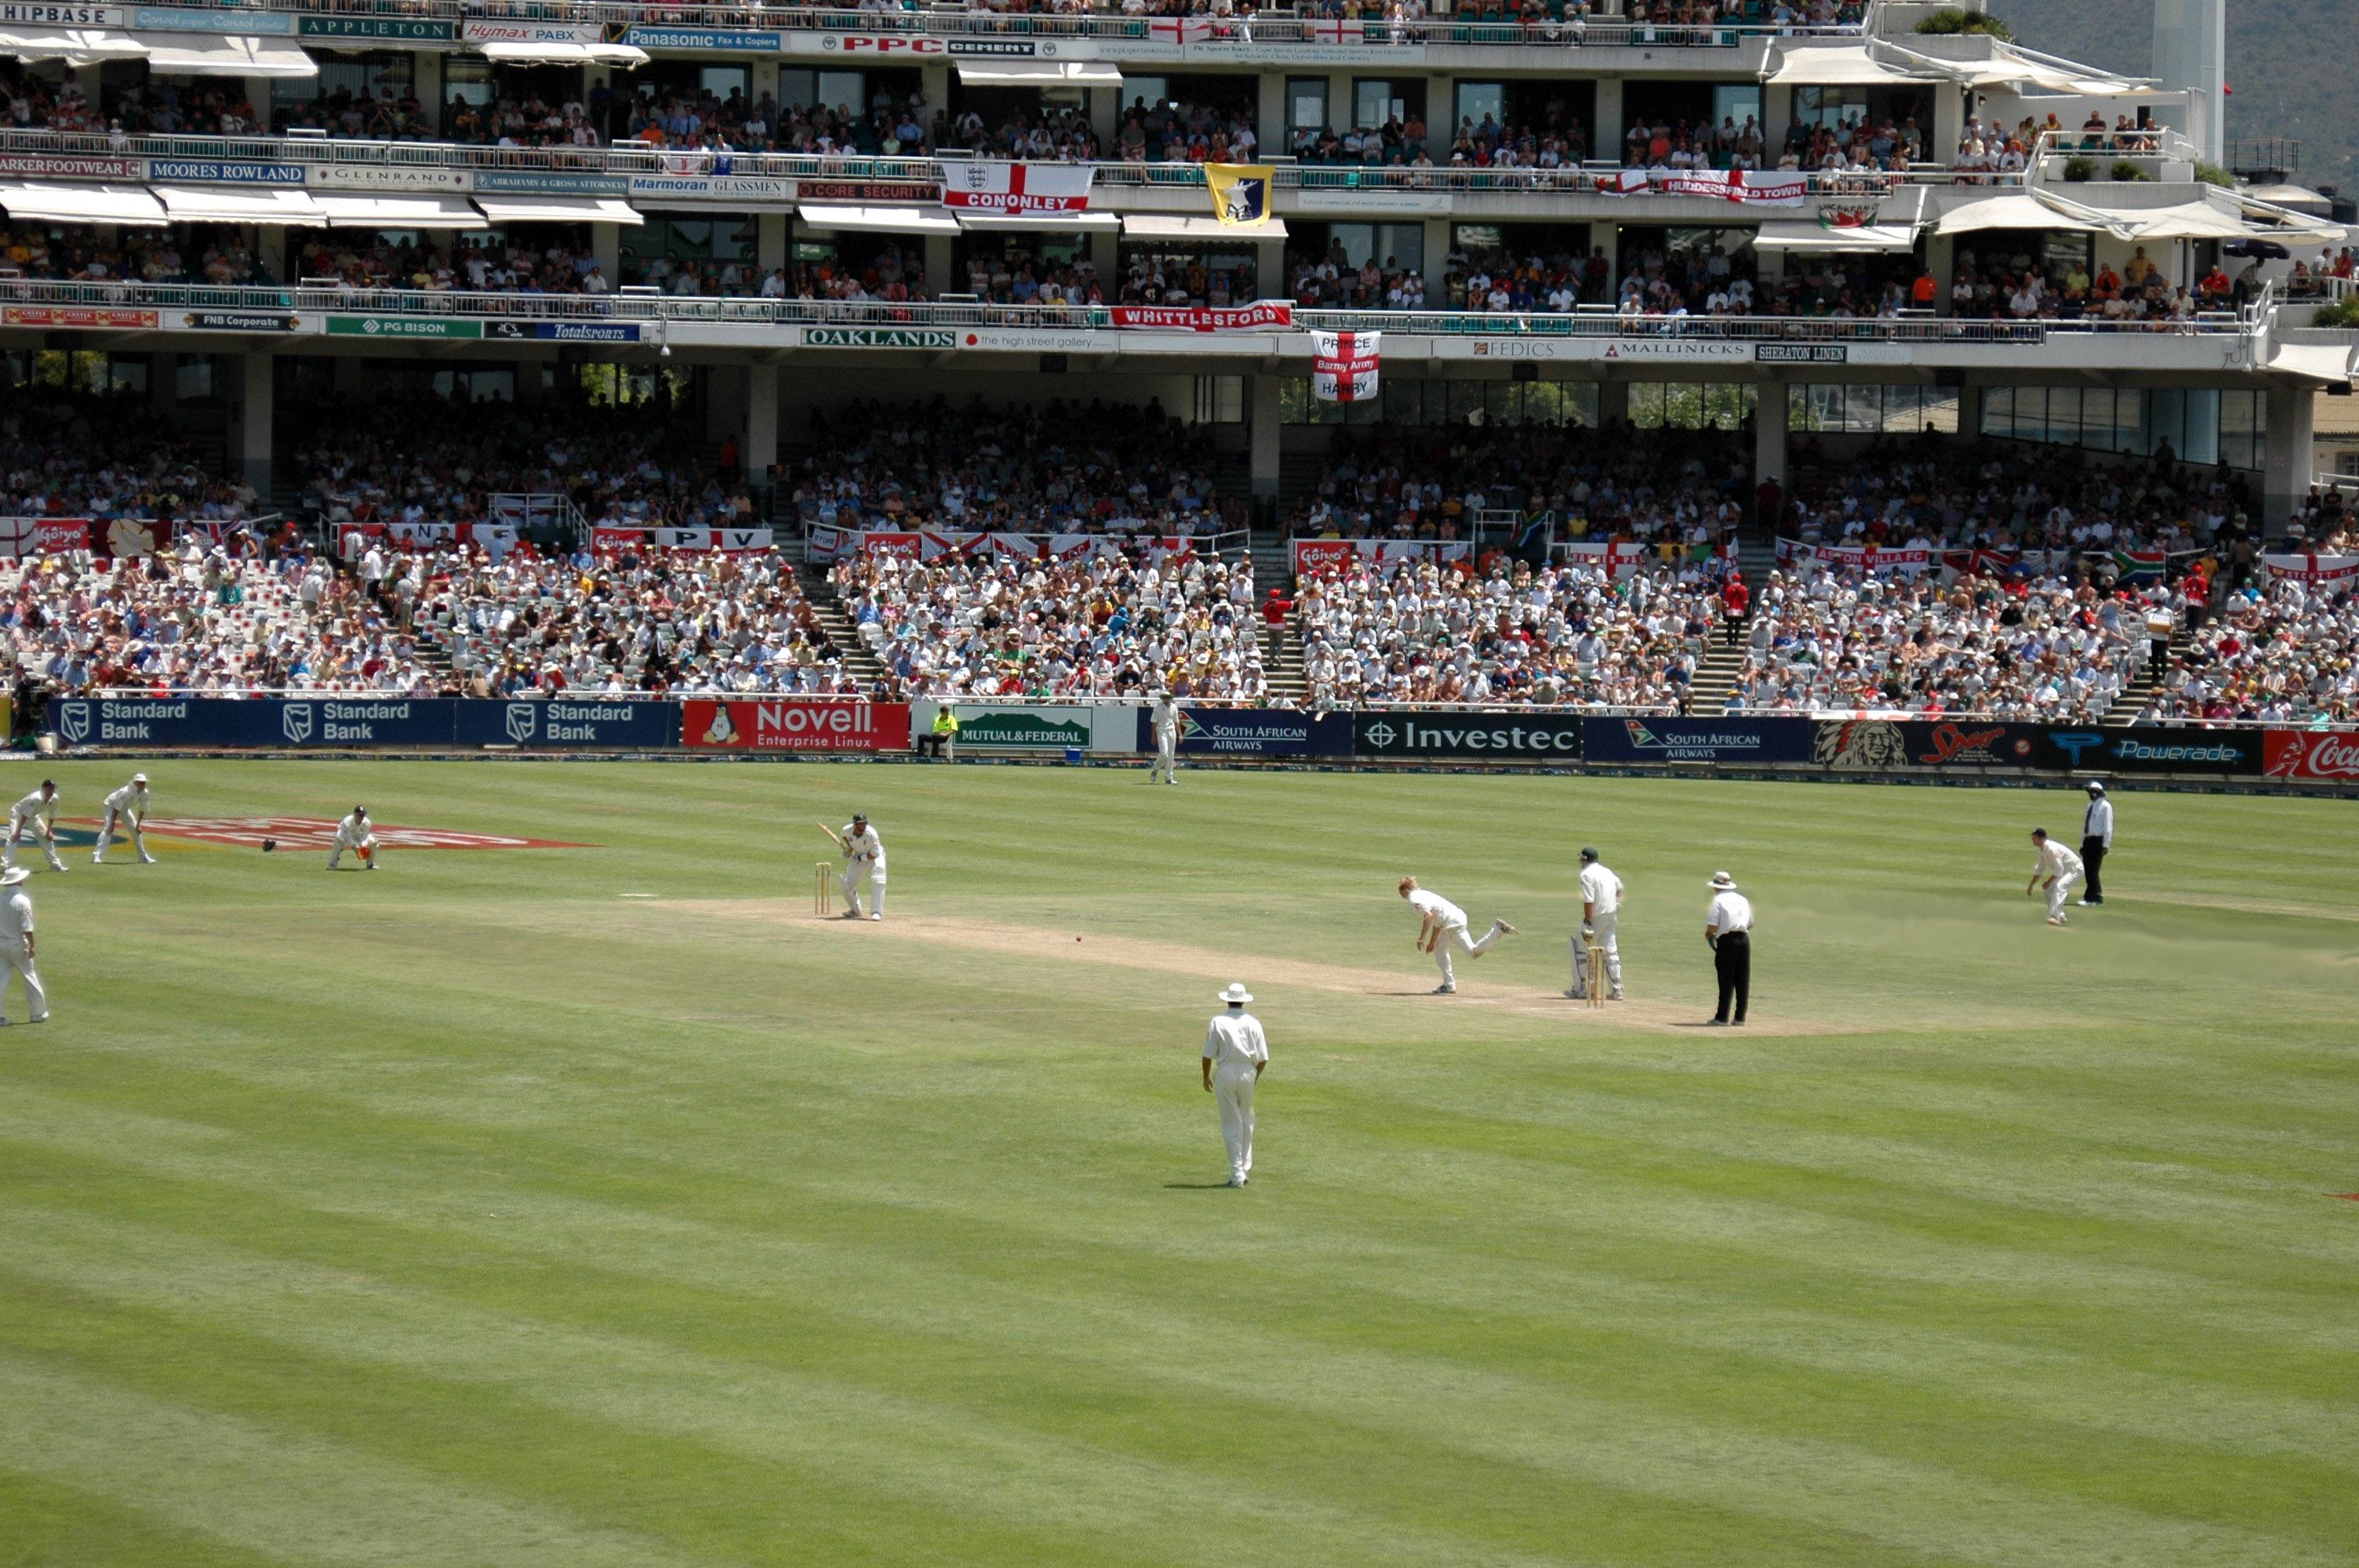 1st match: England vs. New Zealand